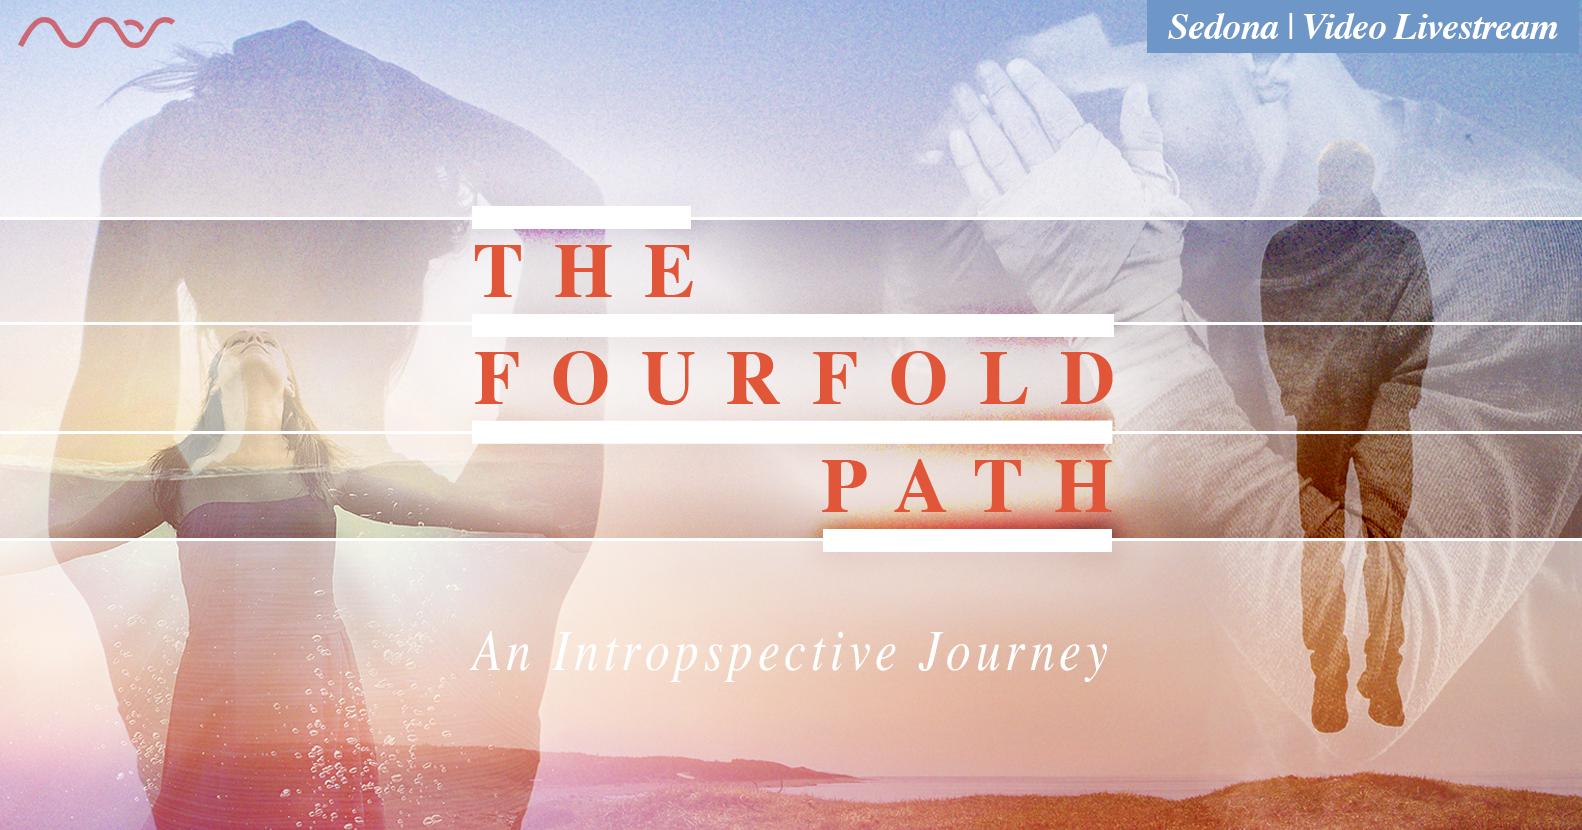 mas-sajady-fourfold-path.png